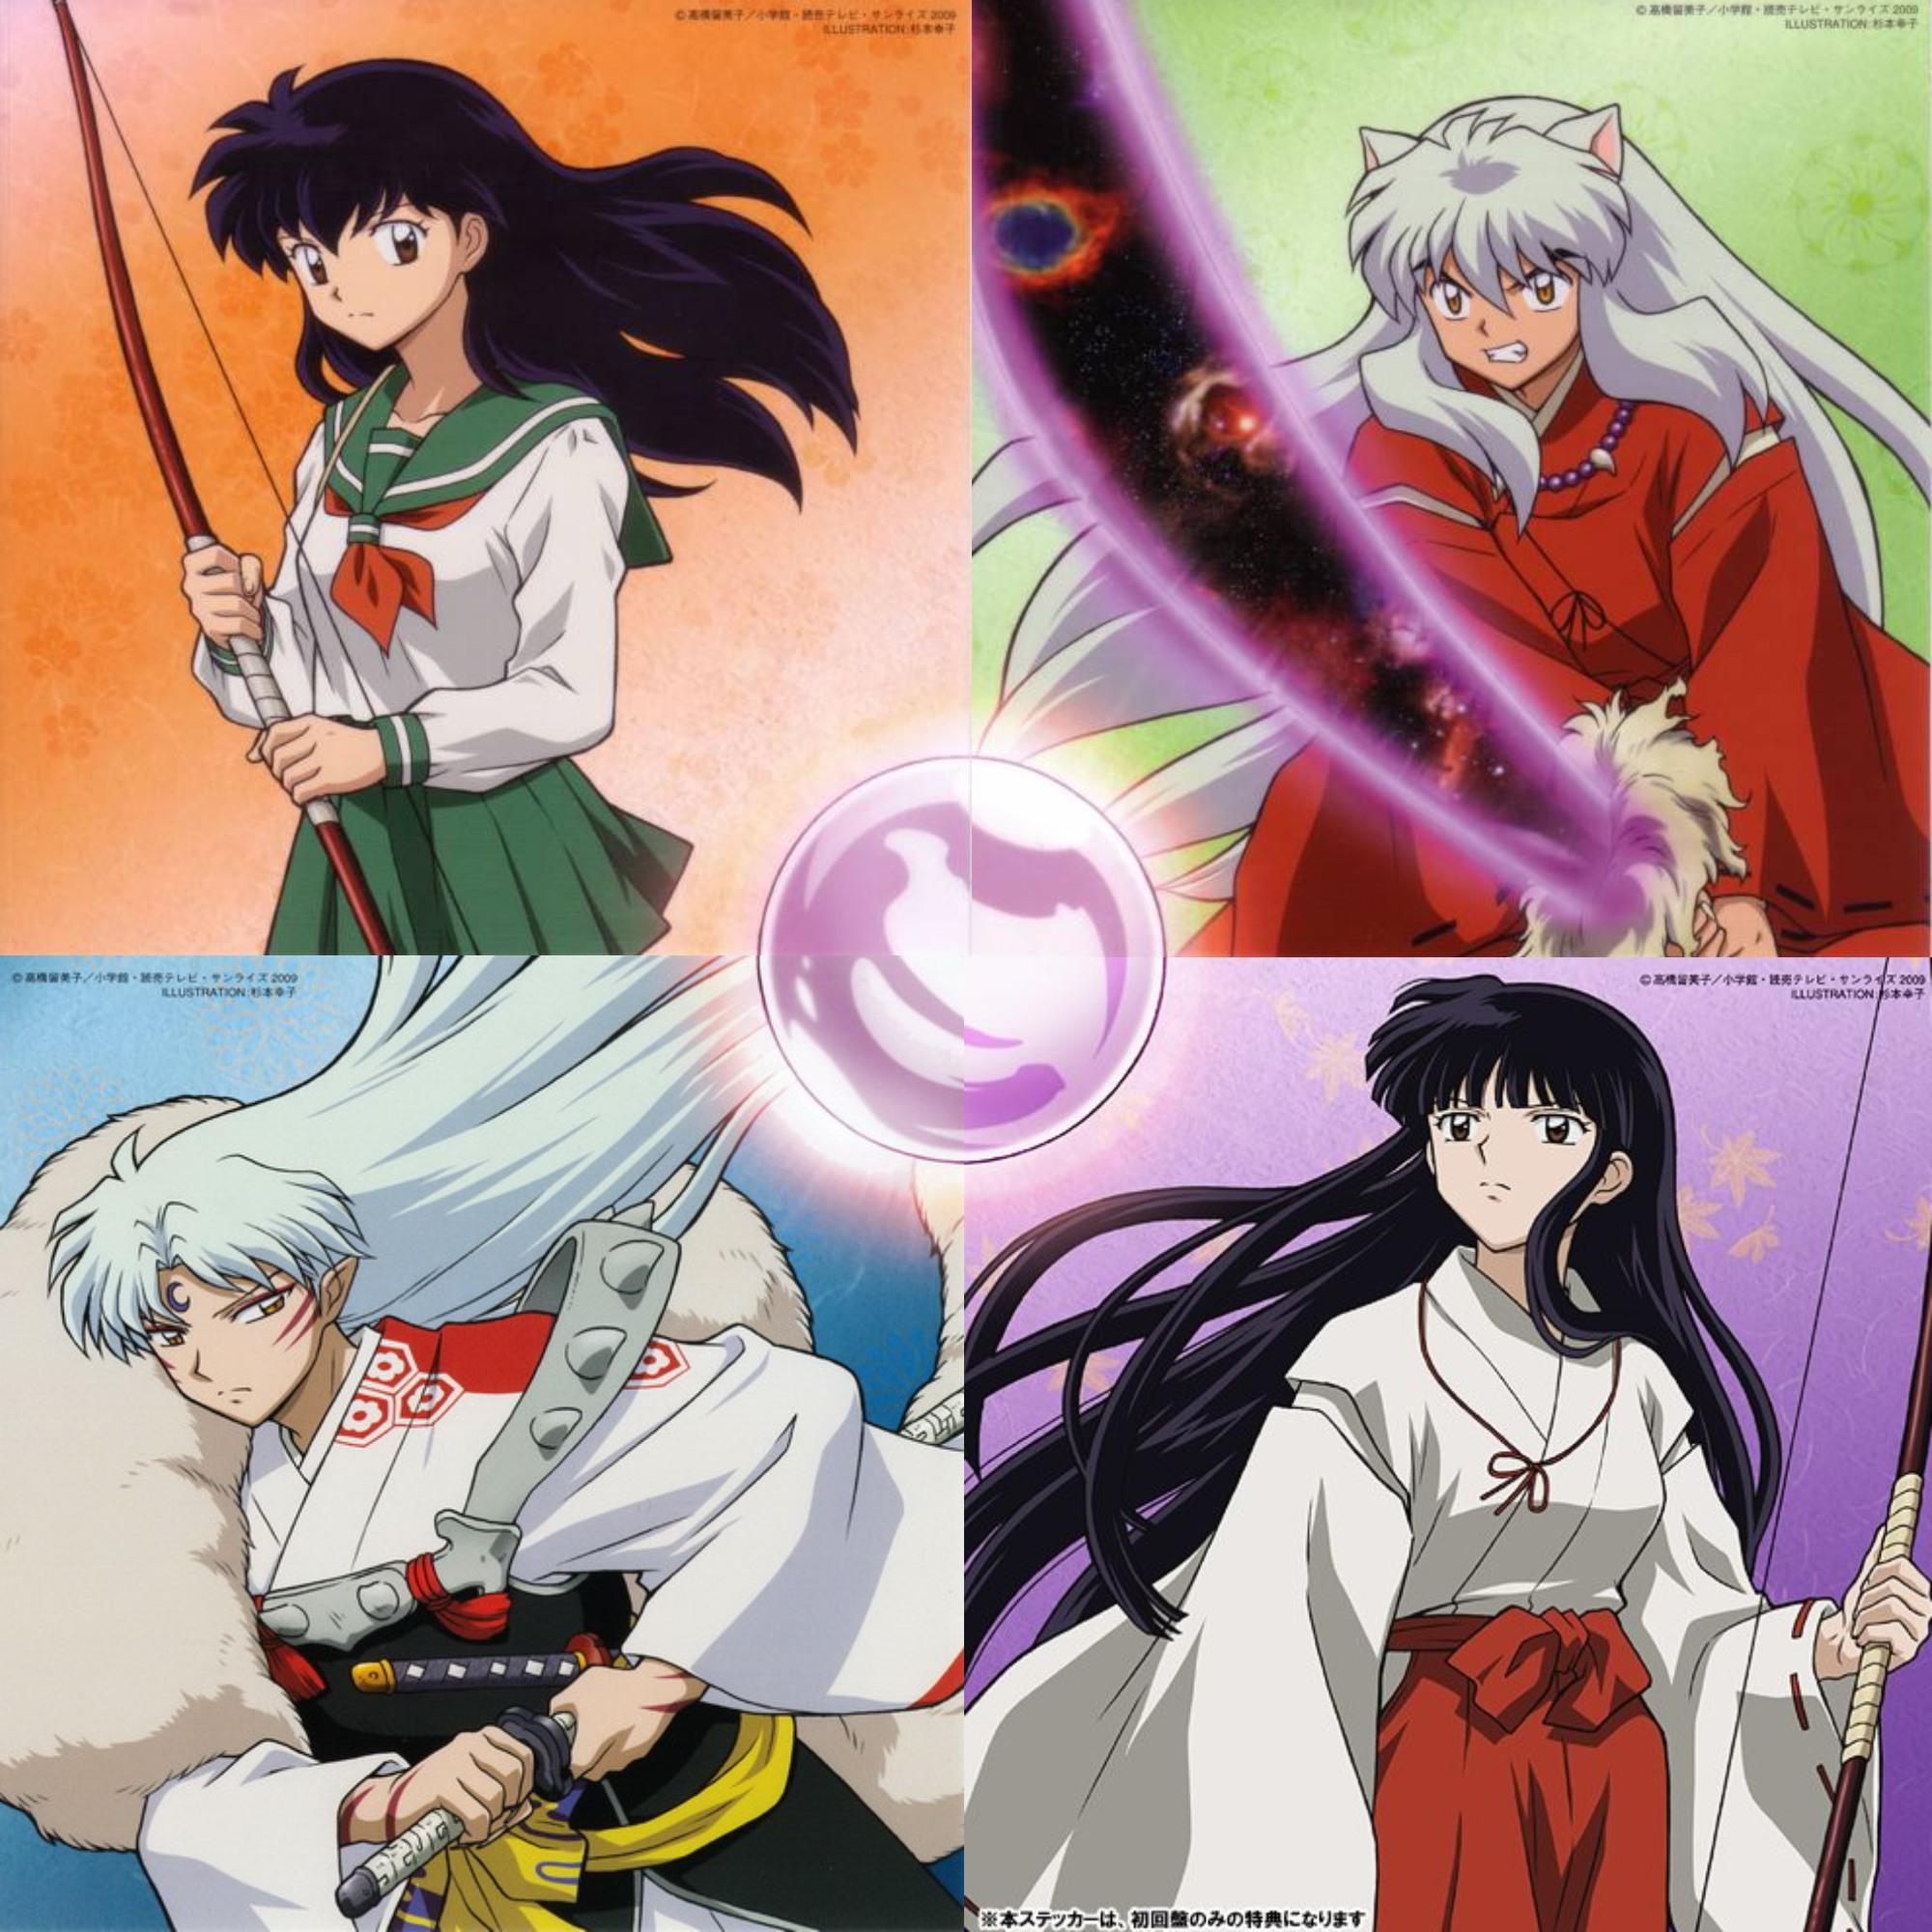 Inuyasha final act Art CDs by LuciaRyuu1994 on DeviantArt